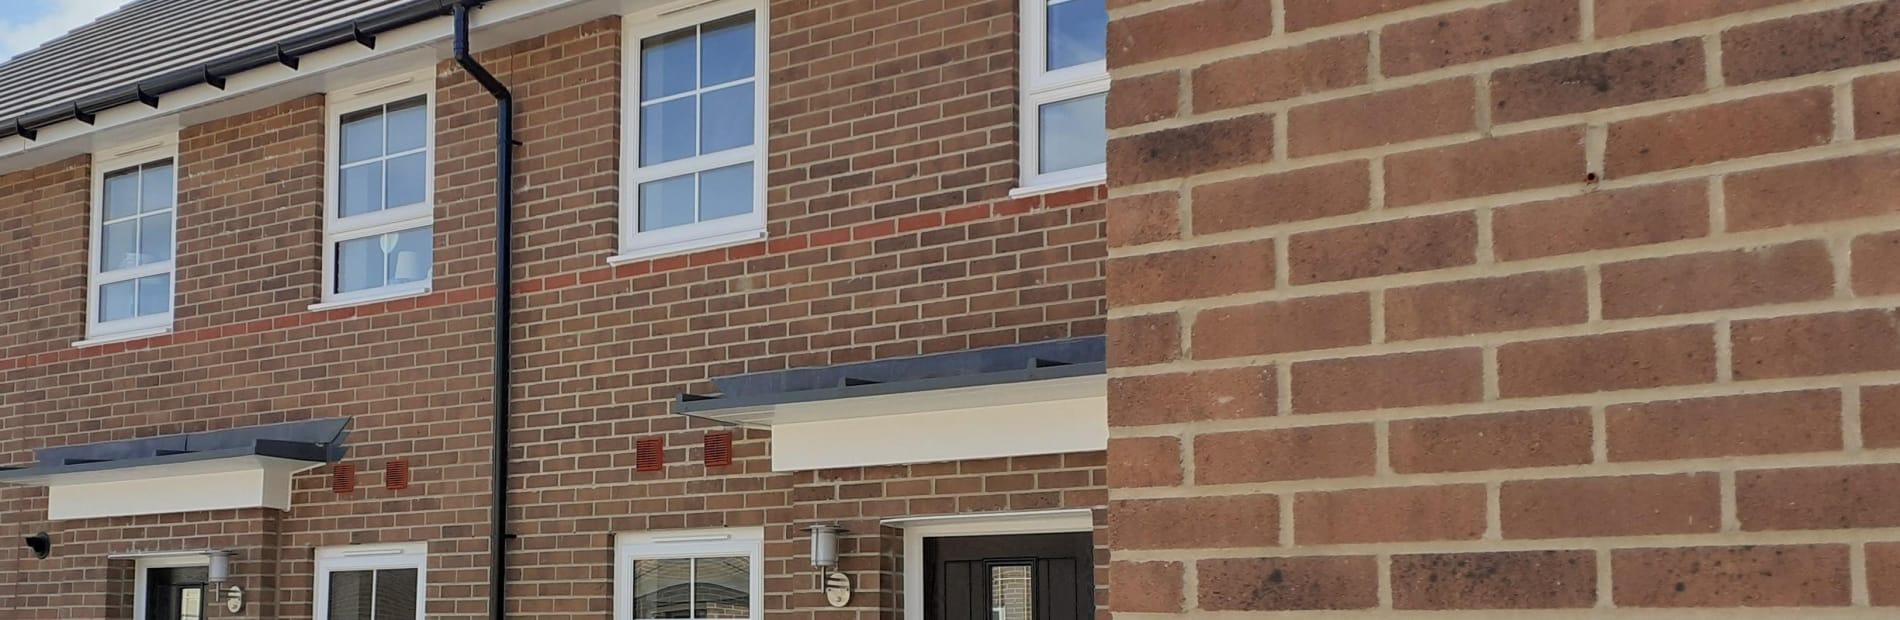 Brown bricks used in a Barratt housing development in Bury St Edmunds